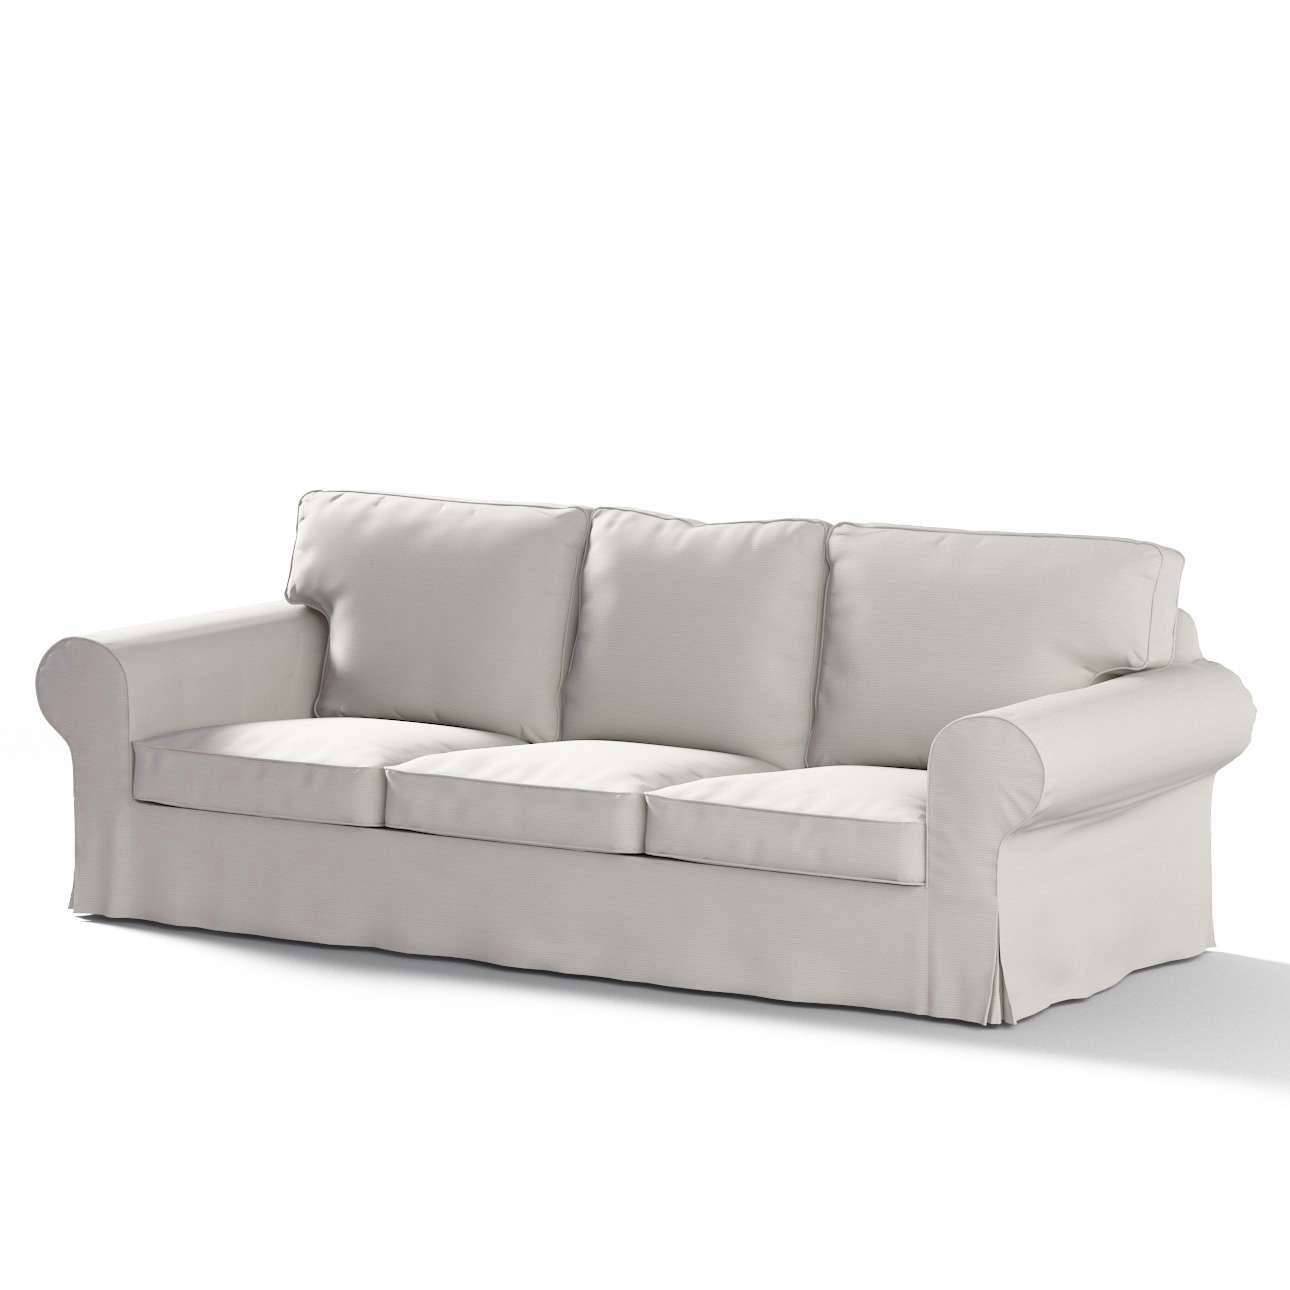 Ektorp 3-Sitzer Schlafsofabezug, ALTES Modell Sofahusse Ektorp 3-Sitzer Schlafsofa von der Kollektion Cotton Panama, Stoff: 702-31